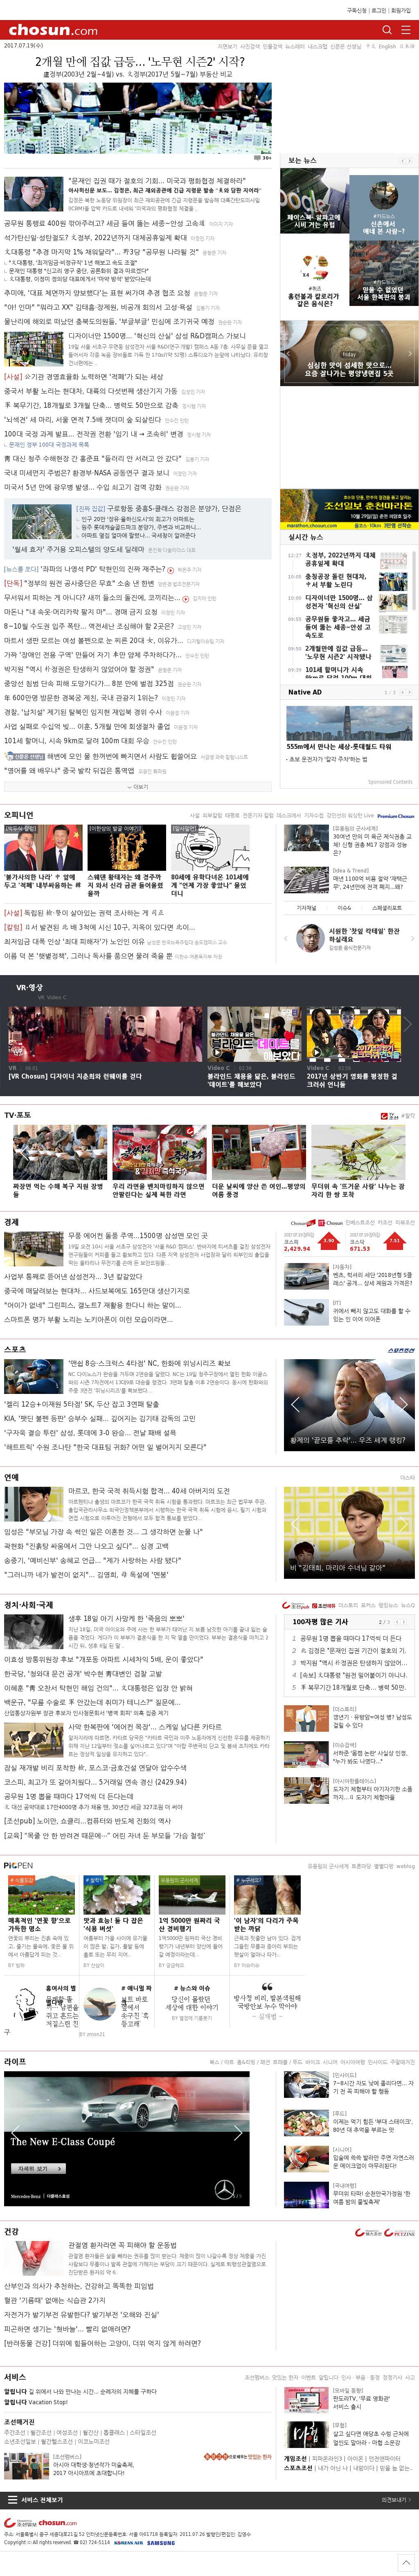 chosun.com at Wednesday July 19, 2017, 2:03 p.m. UTC